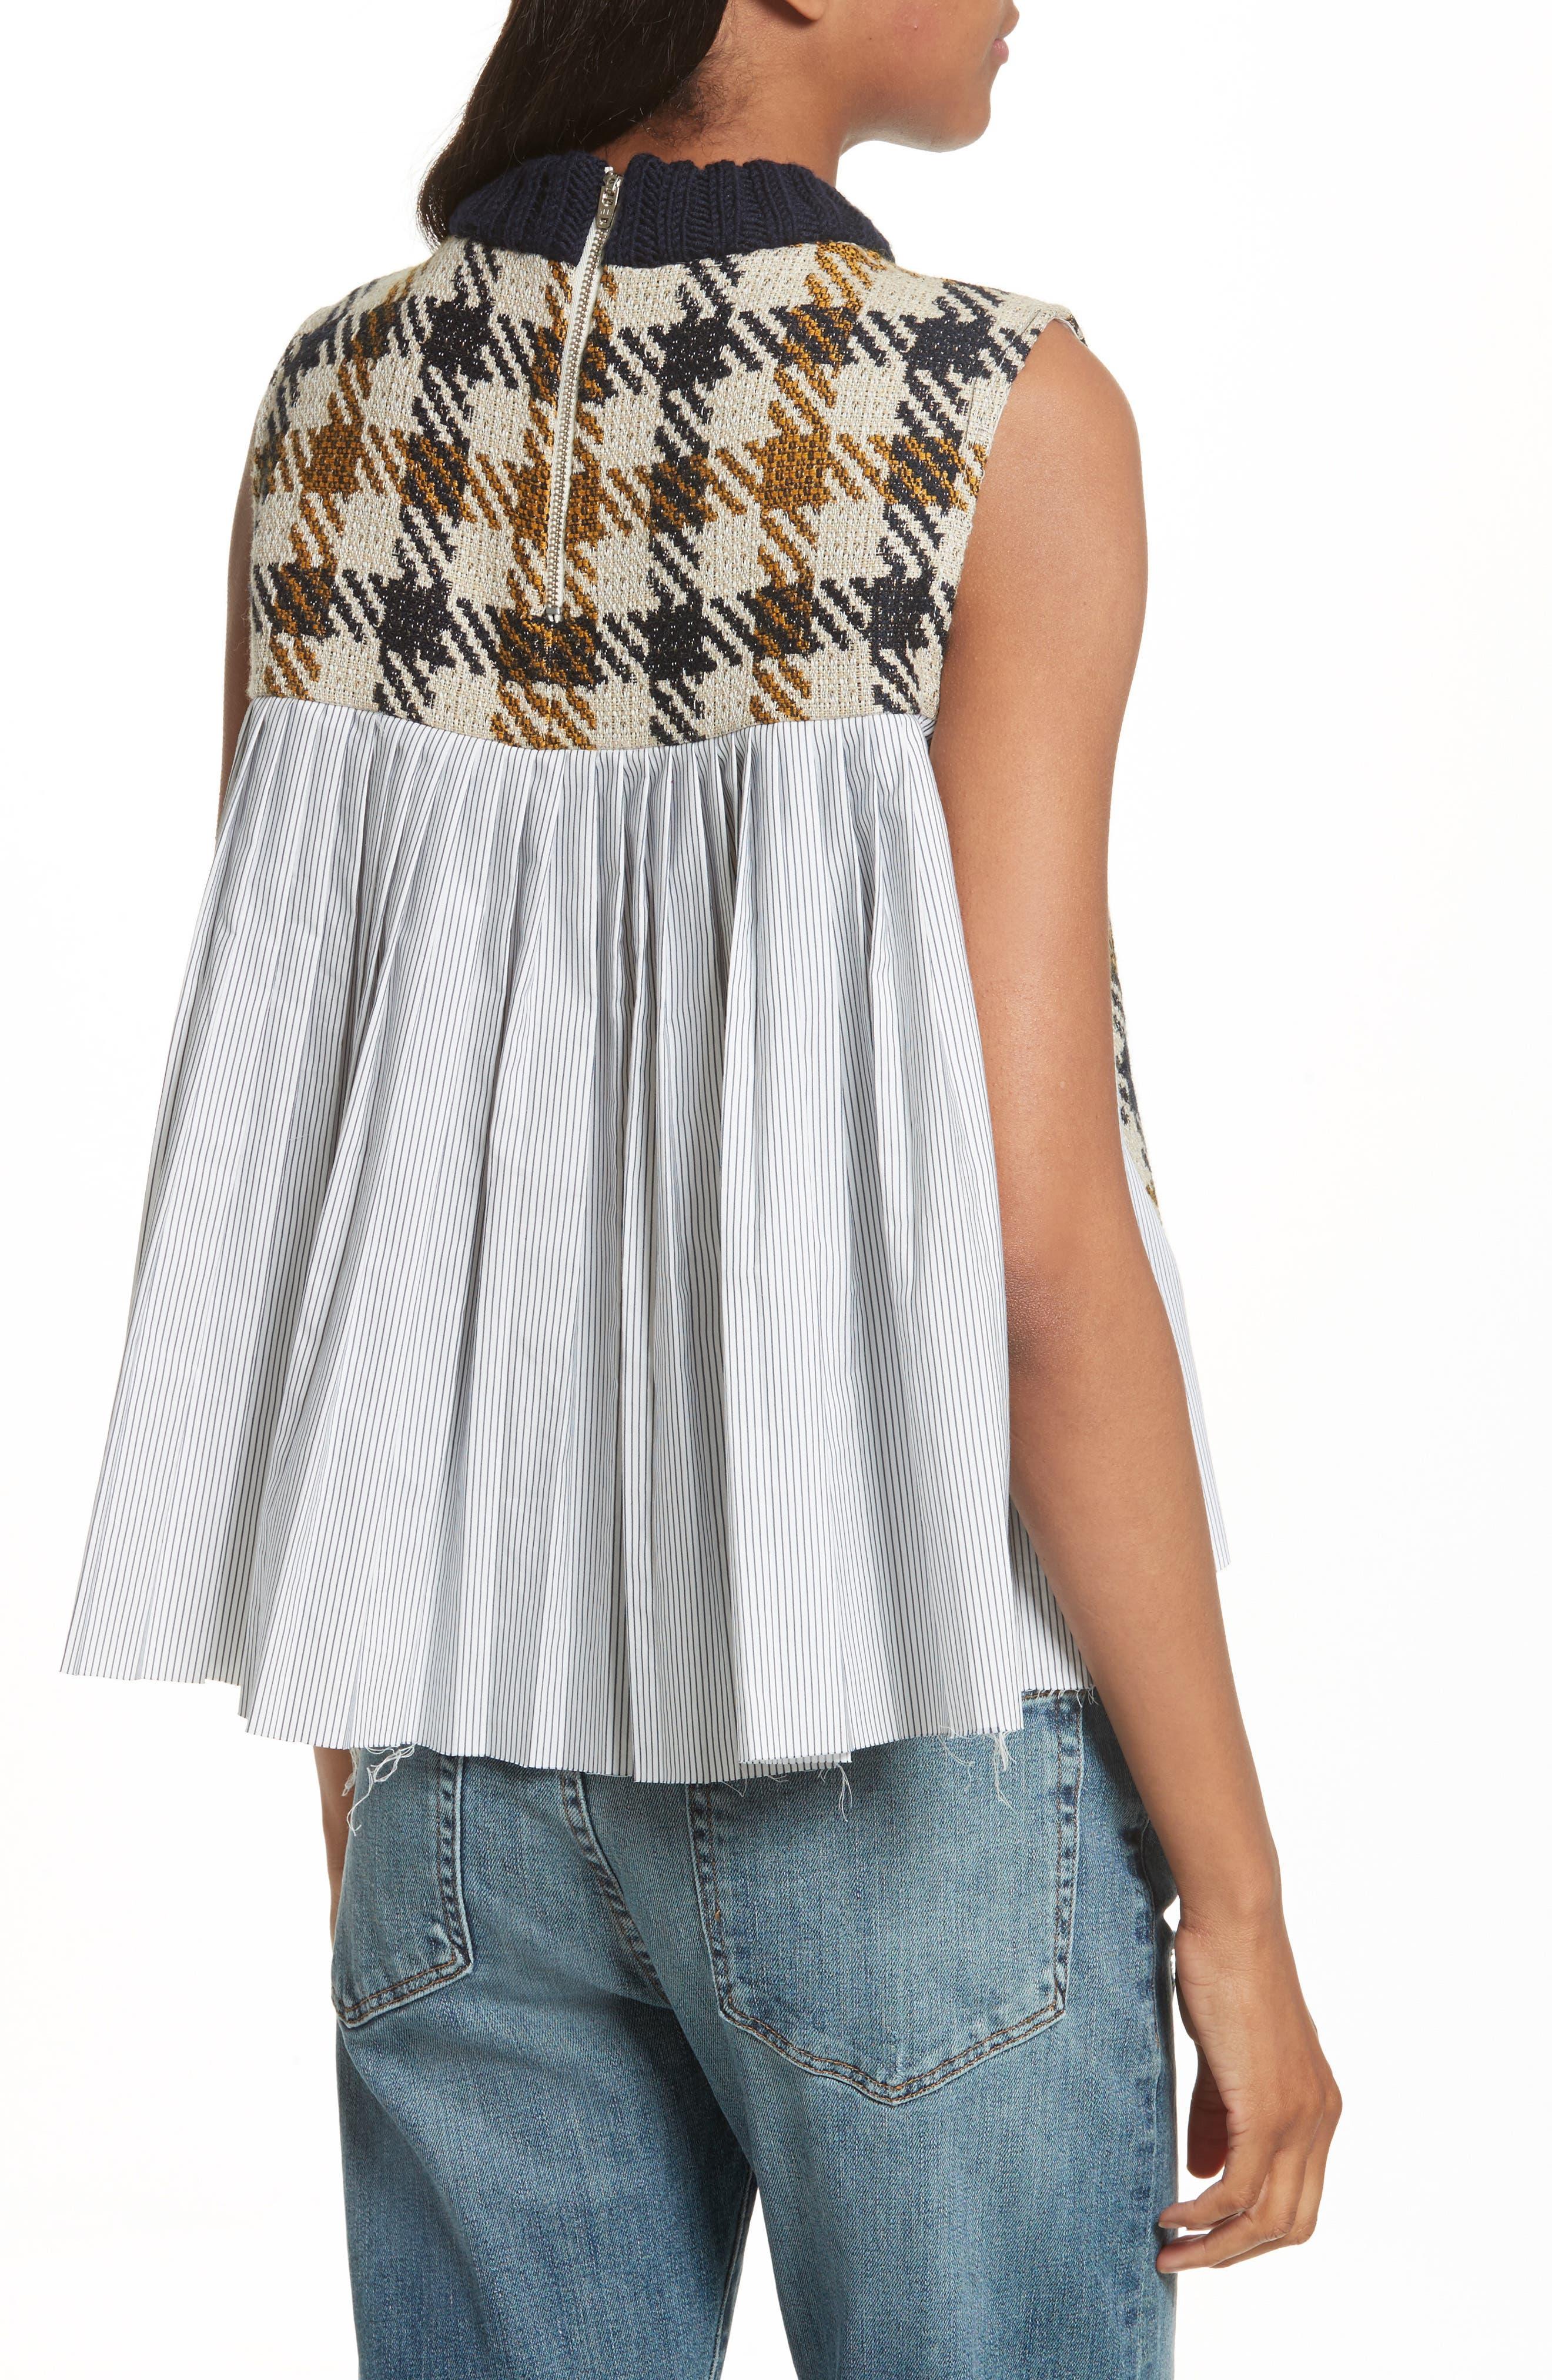 Combo Vest,                             Alternate thumbnail 2, color,                             Cream/ Black/ Yellow Multi